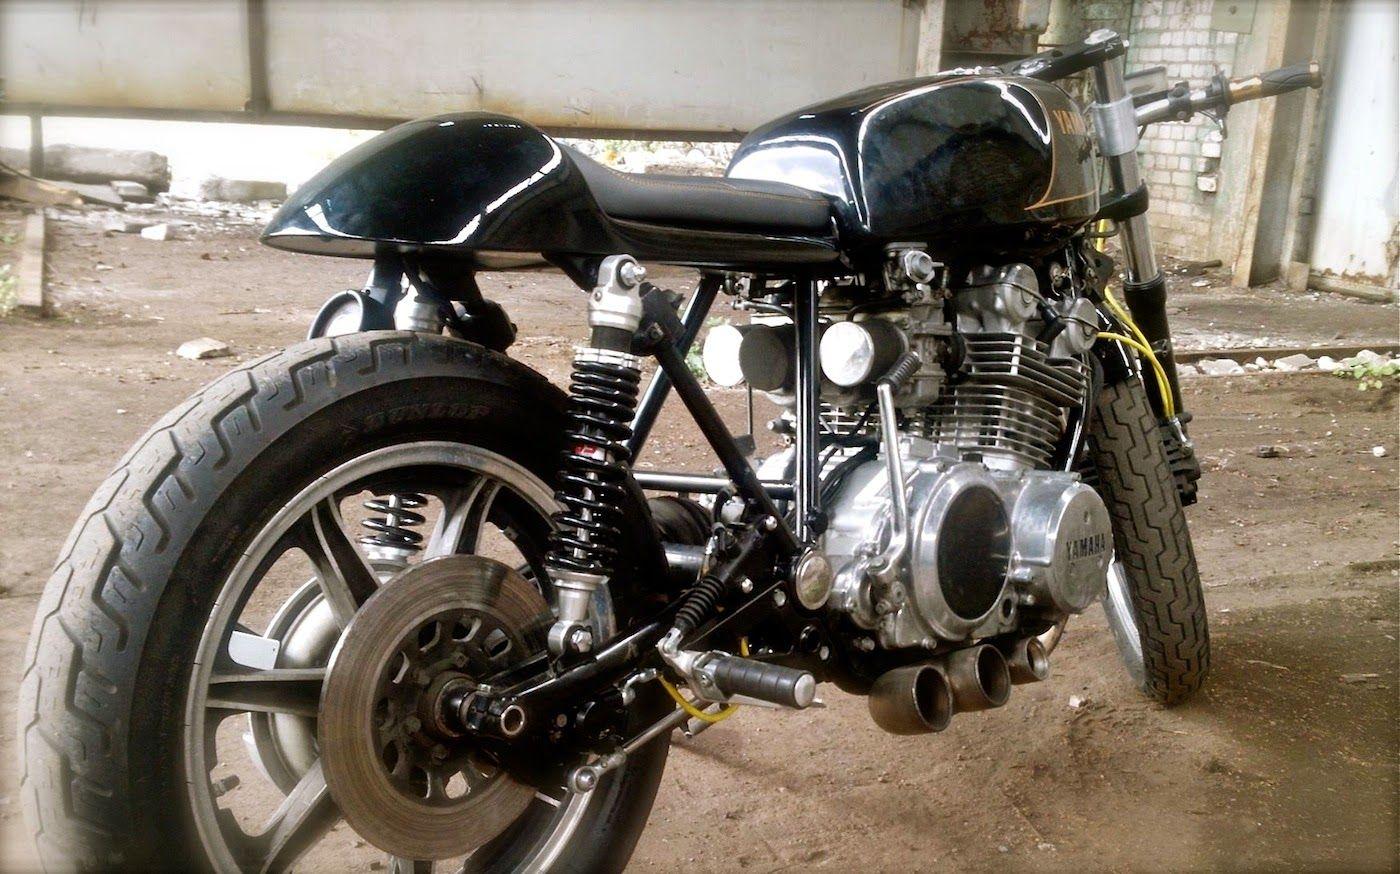 Suzuki Bandit Cafe Racer | 99garage | Cafe Racers Customs Passion Inspiration | Motor, Autos en